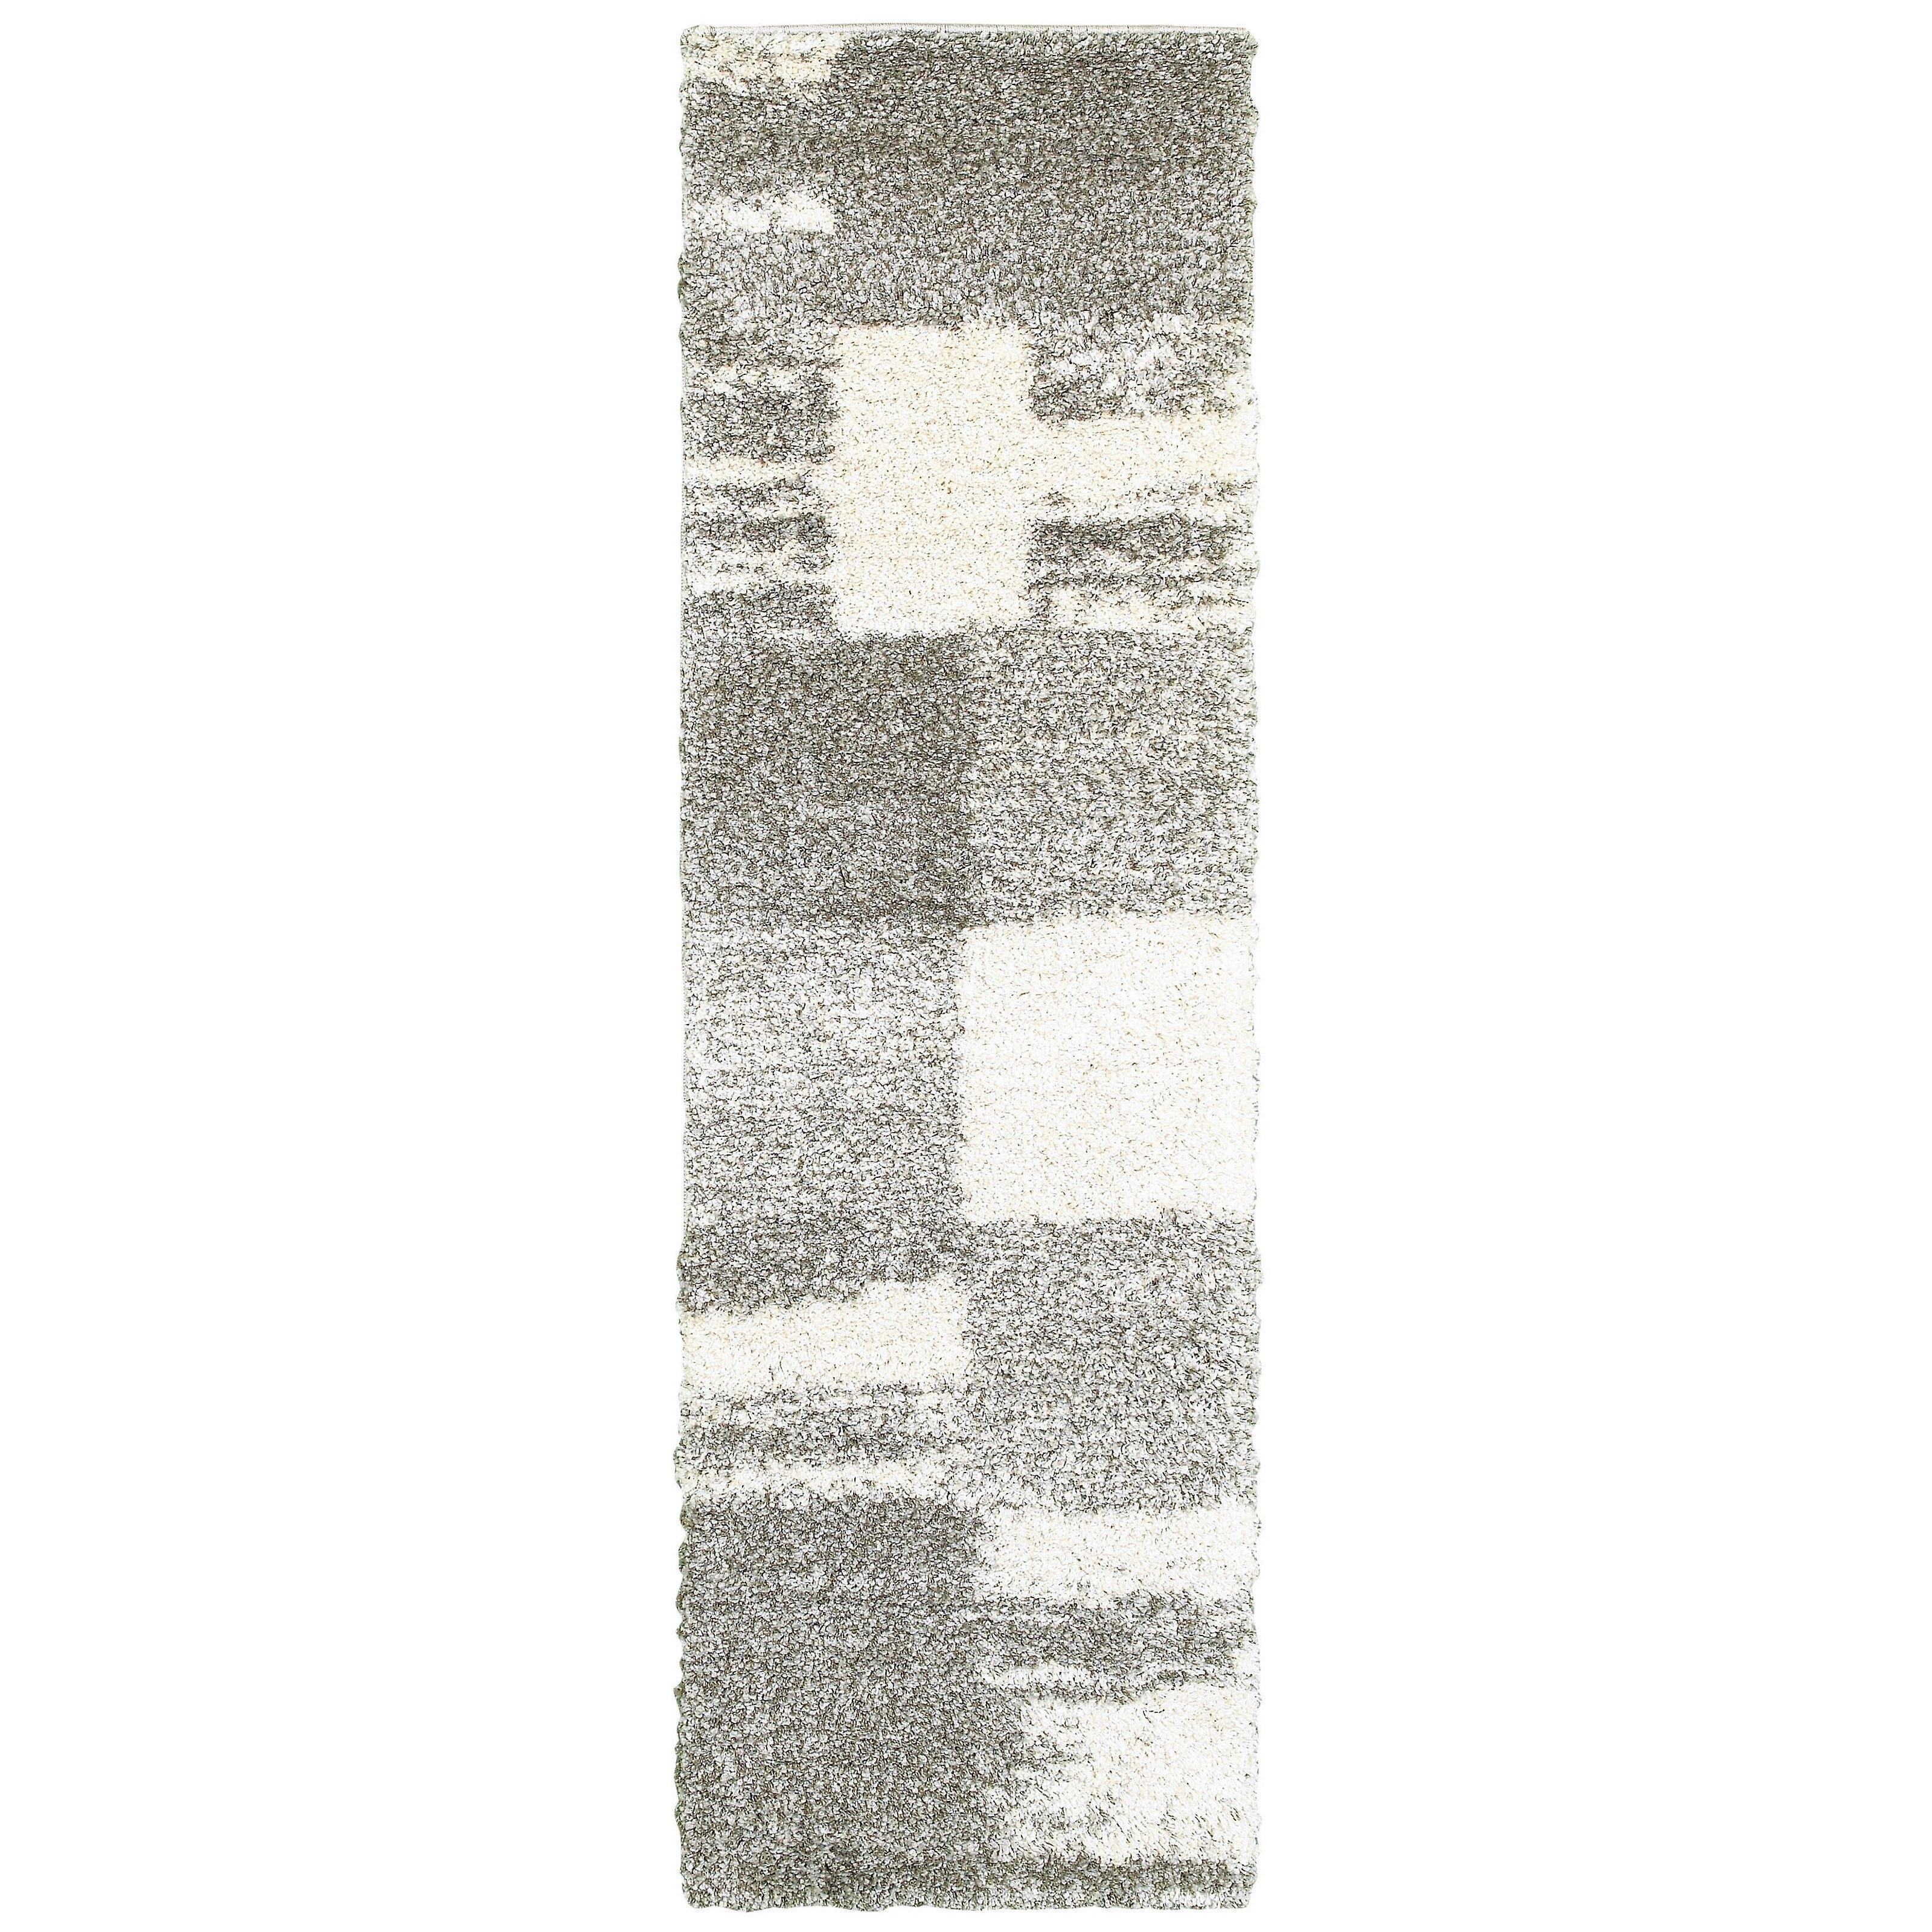 Henderson 5502h ivory/ grey indoor area rug rectangle 5'3